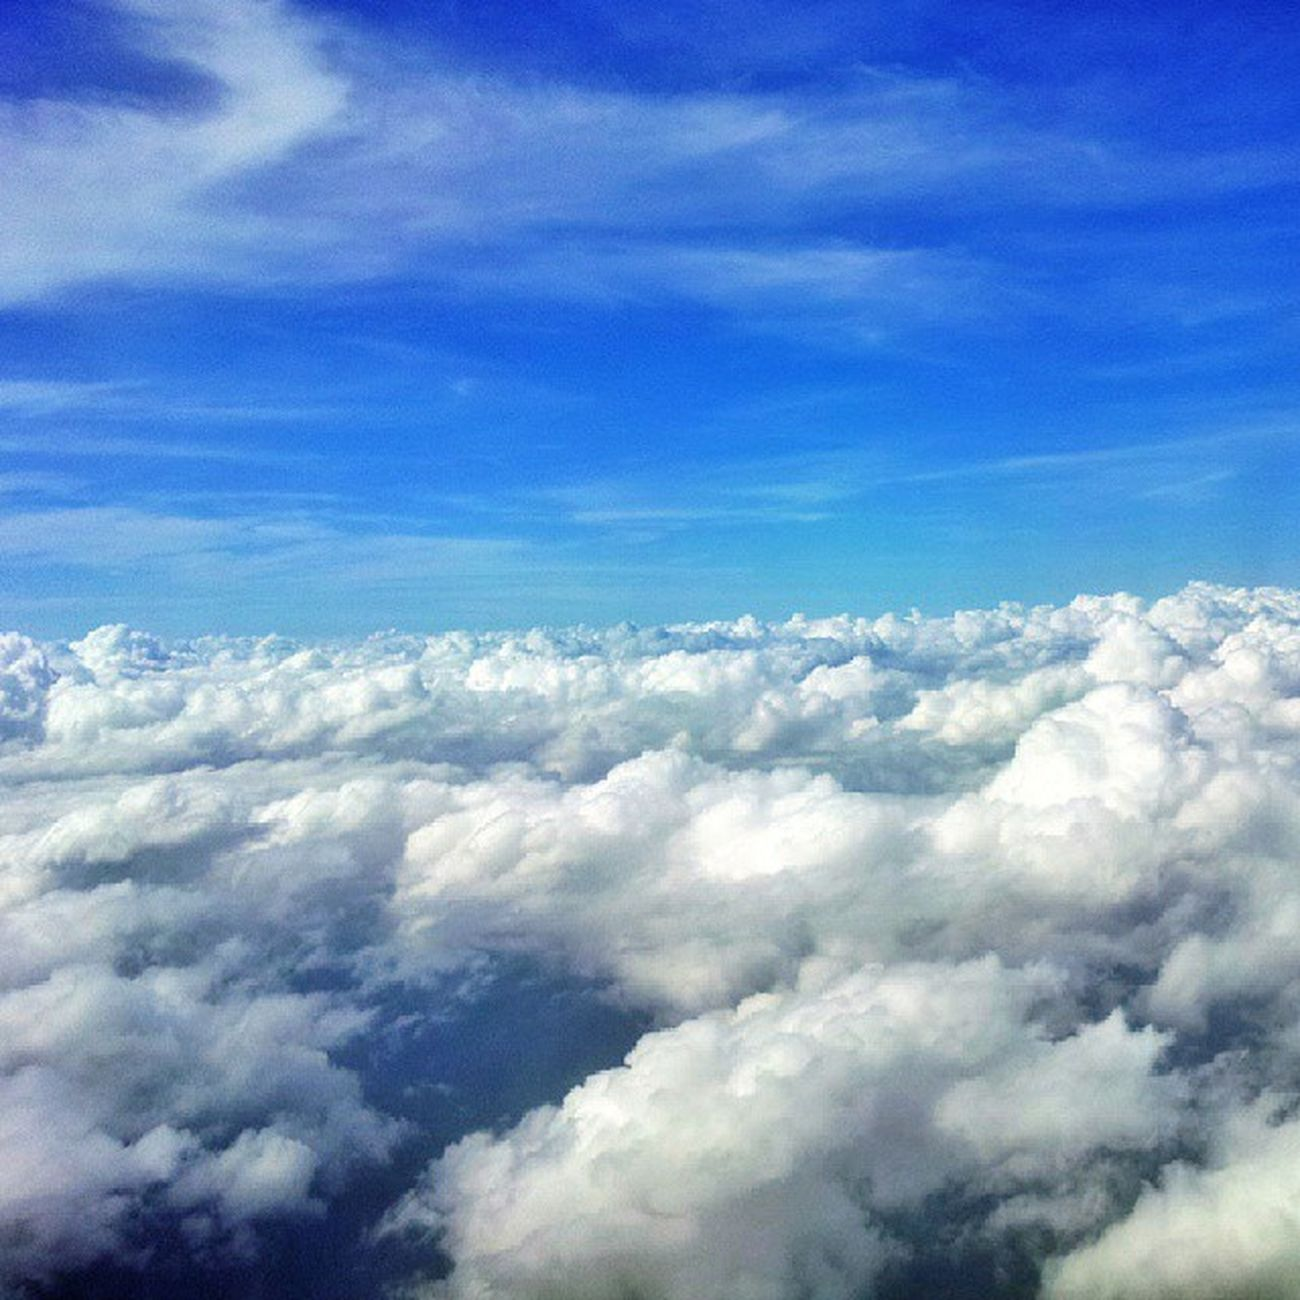 Beautiful Morning Flight Buddhaair clouds cloudsporn cloudstagram blue nepal photooftheday picoftheday instaphoto instadaily instanepal moments freeyourmind